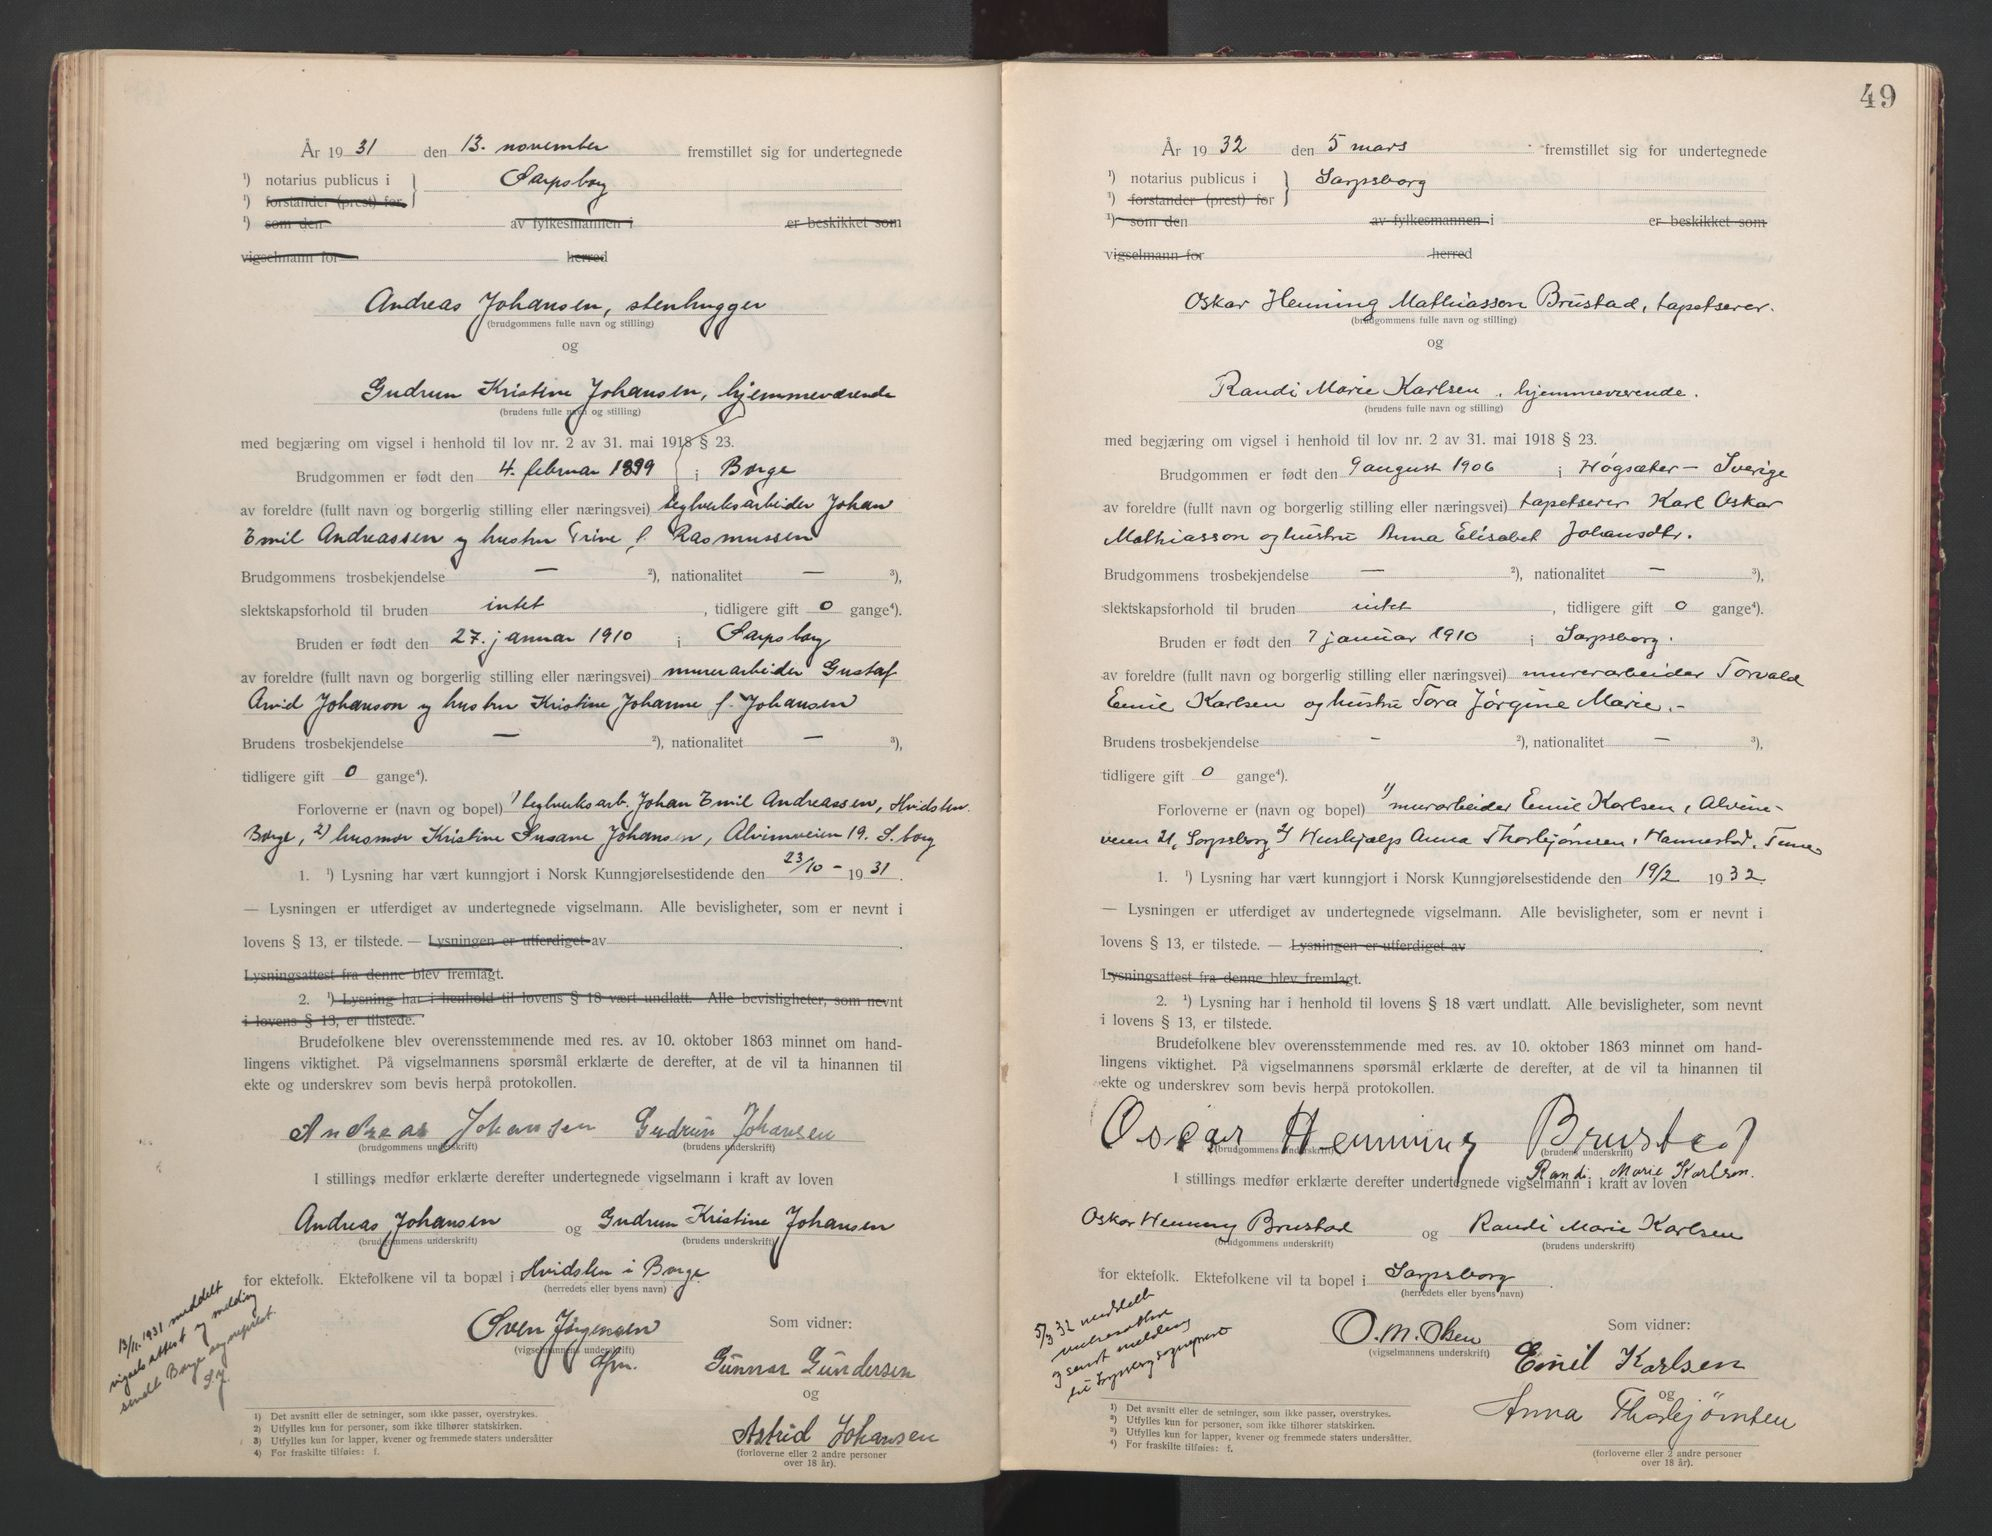 SAO, Sarpsborg byfogd, L/Lb/Lba/L0001: Vigselbok, 1920-1941, s. 49